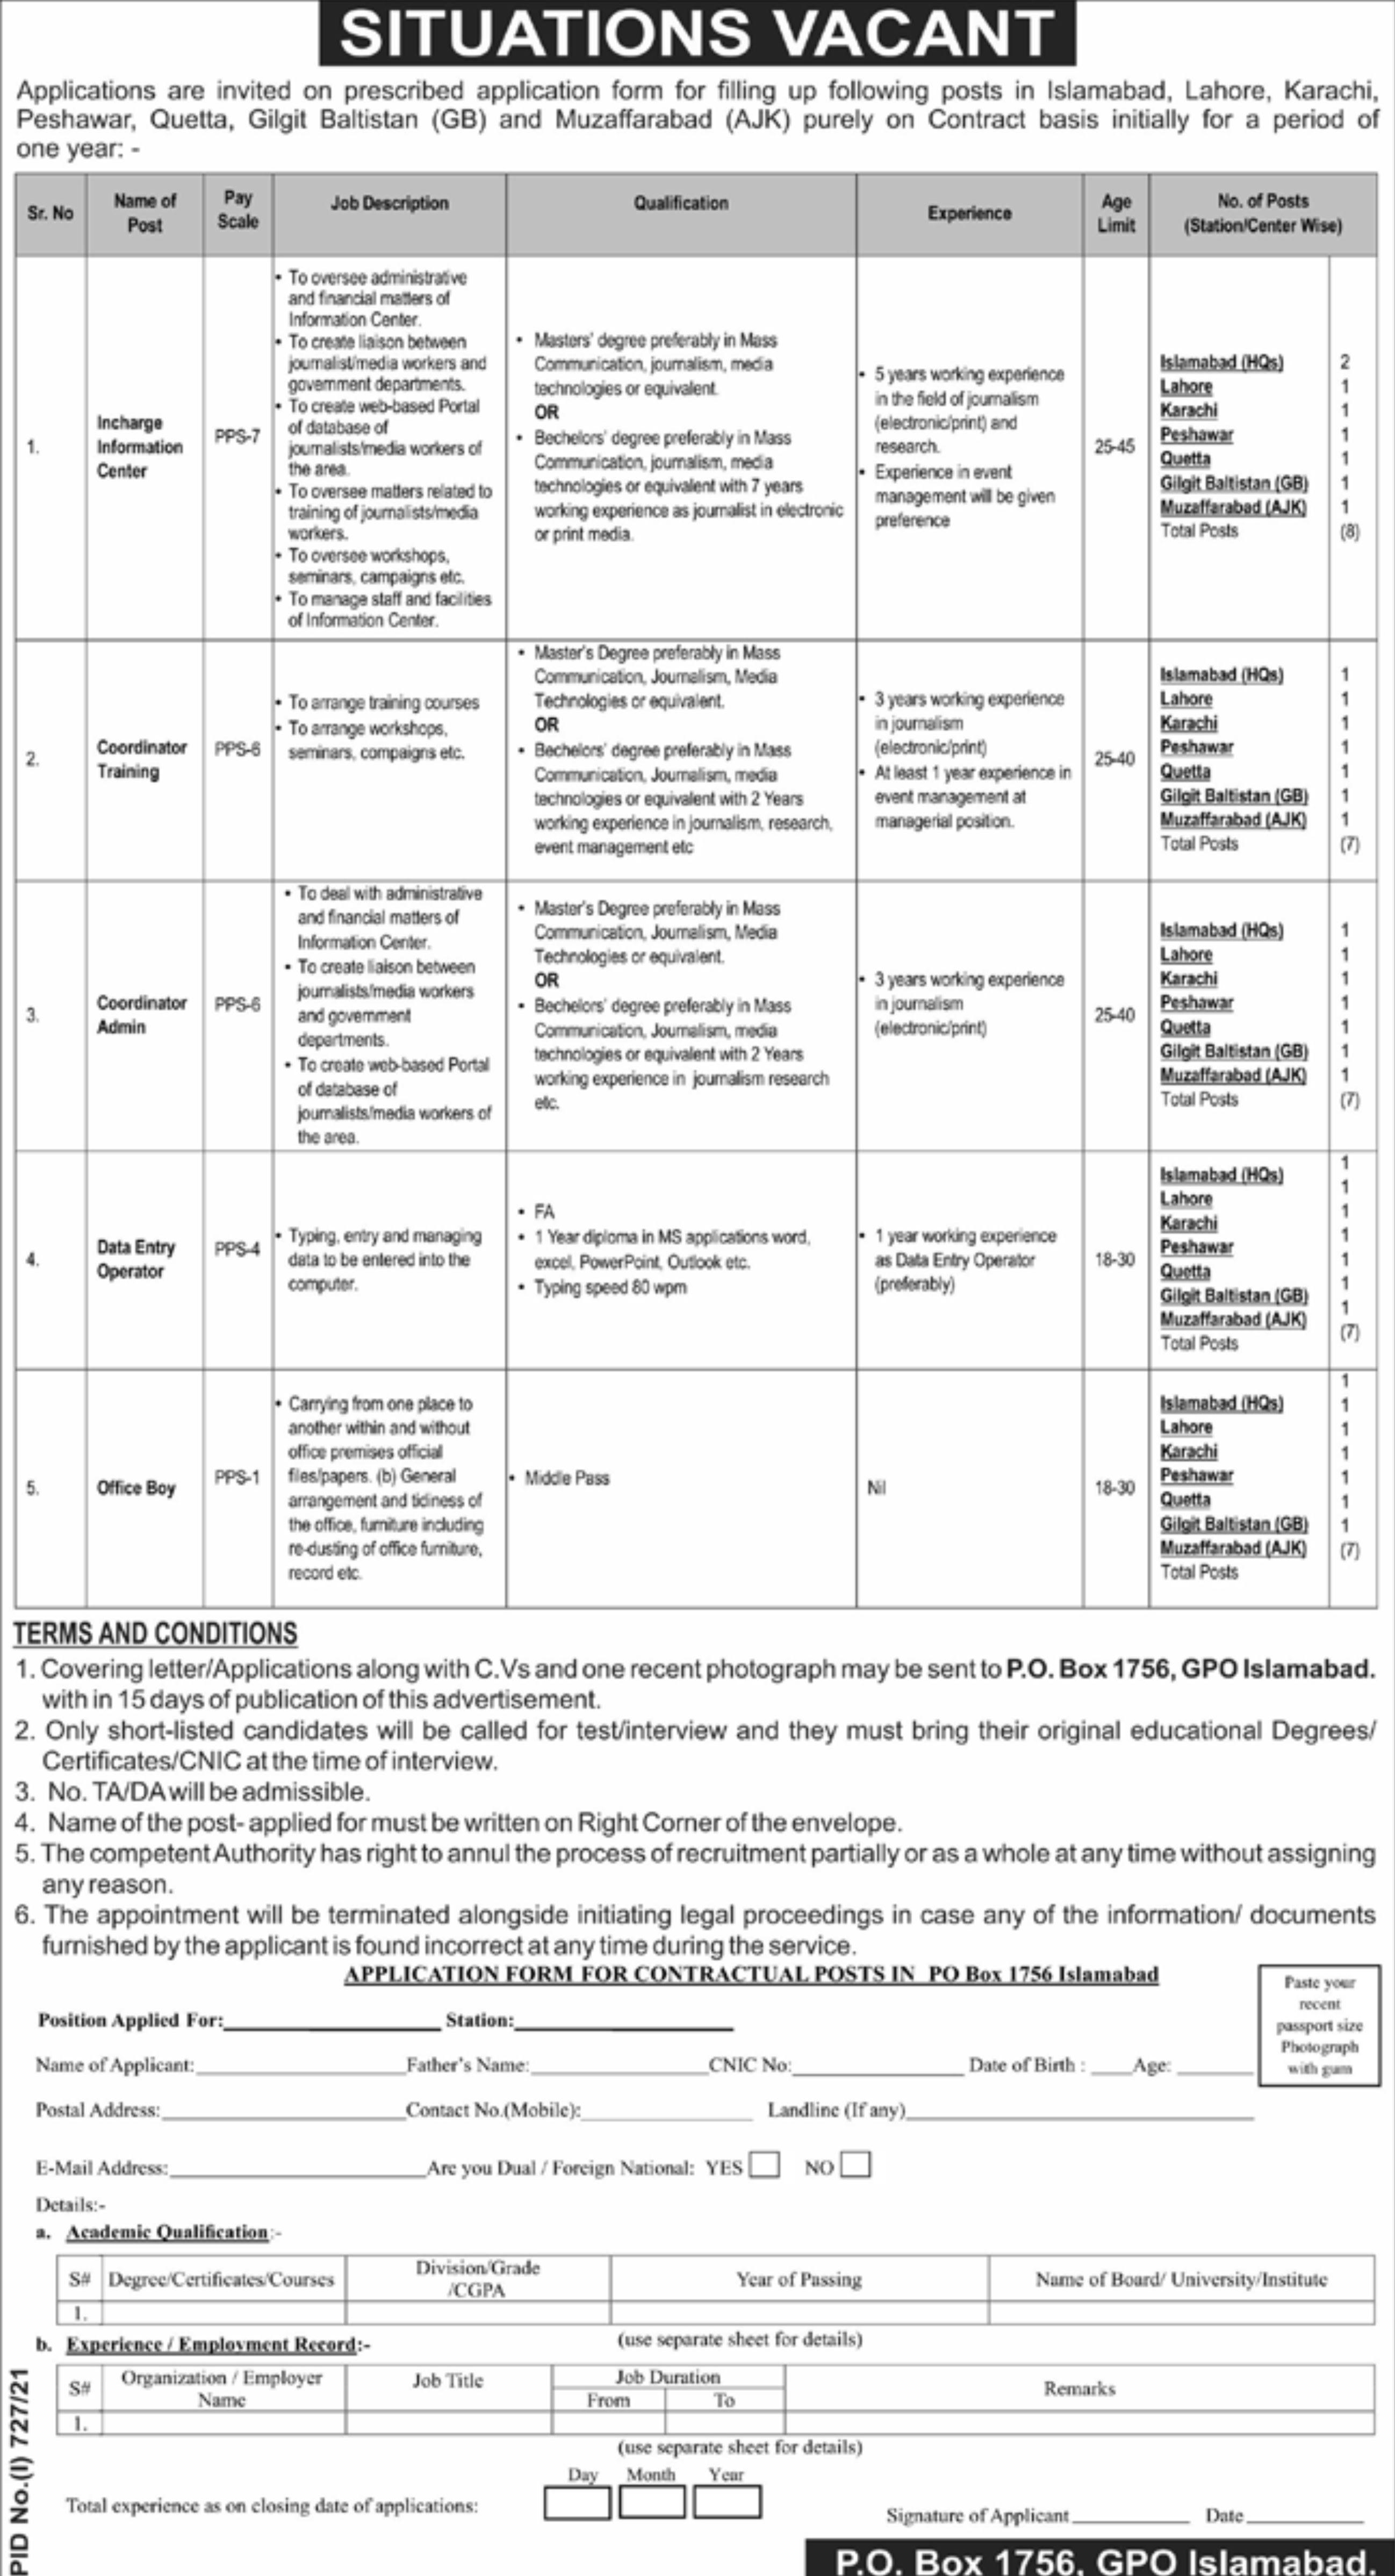 PO Box 1756 GPO Islamabad Vacancies 2021 1